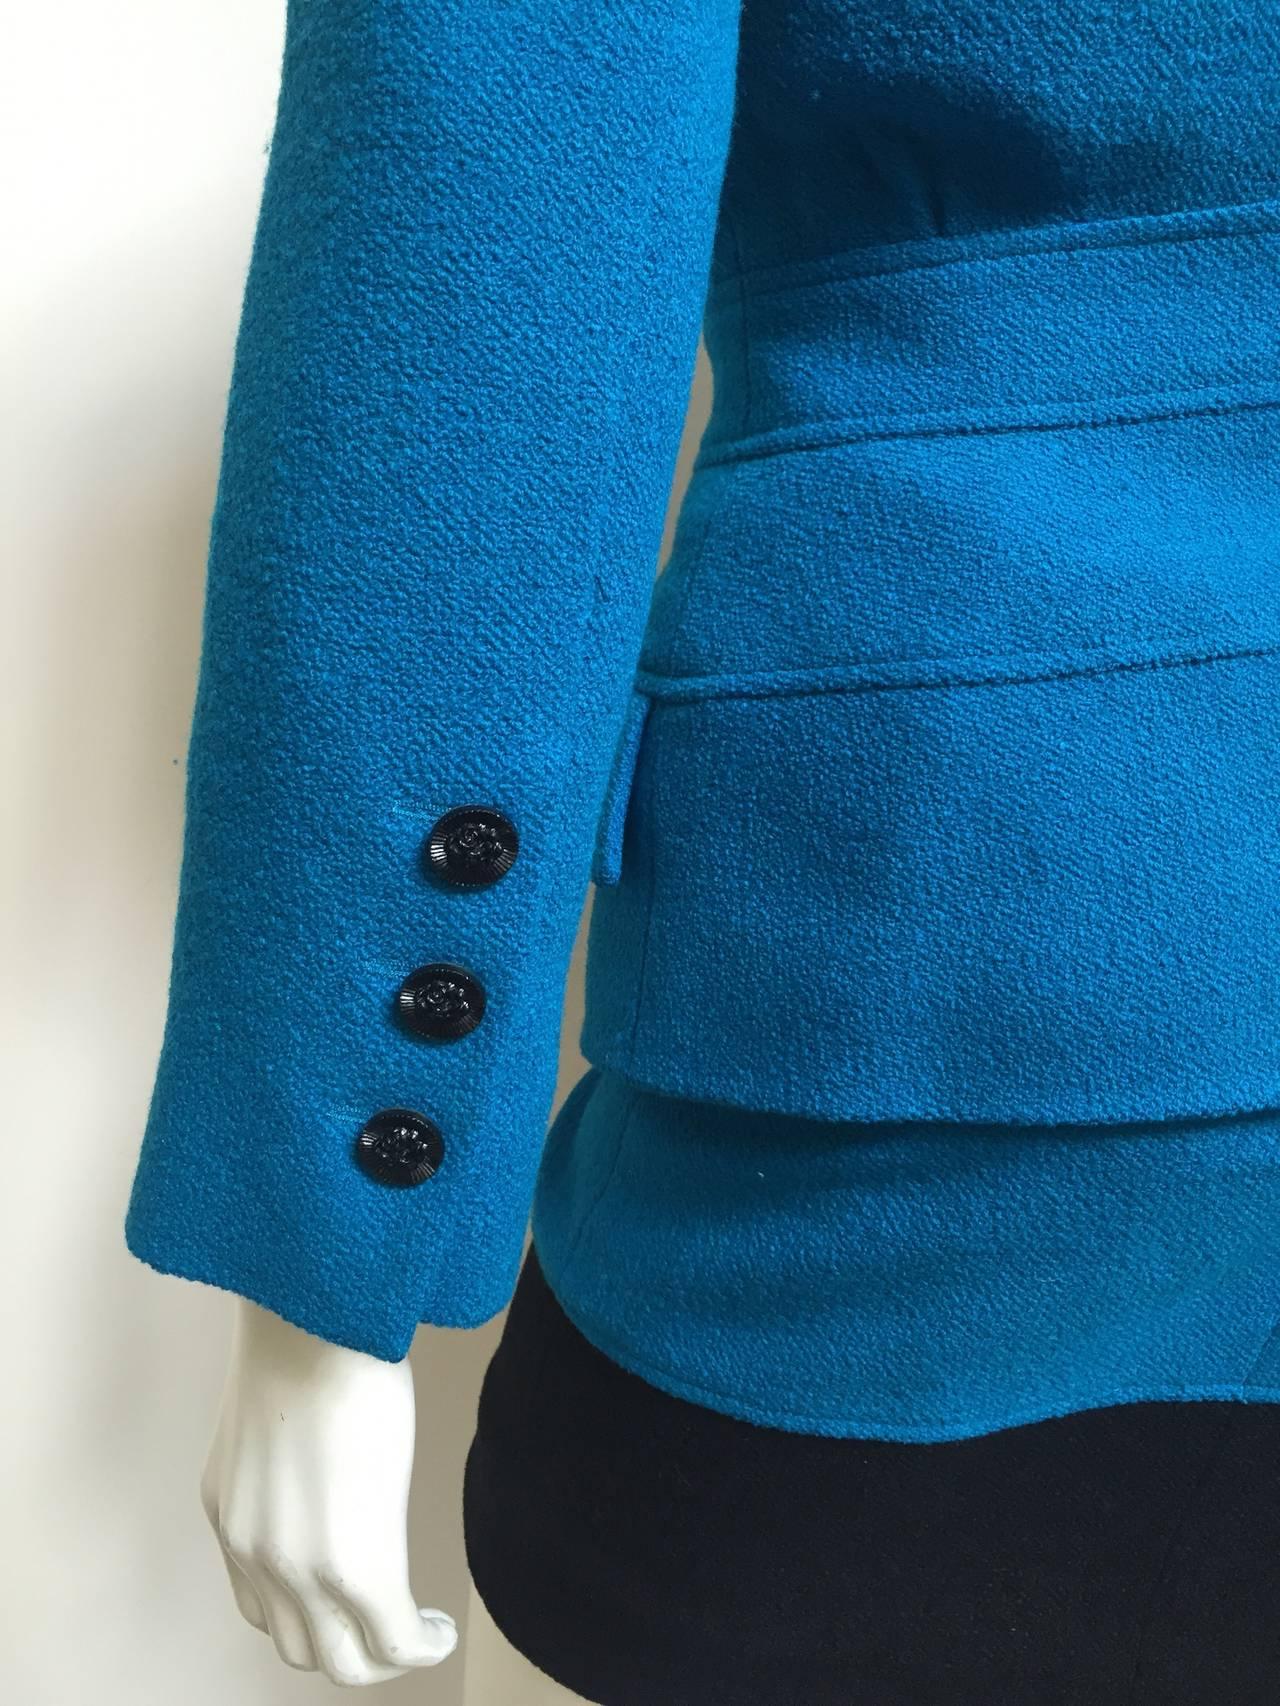 Karl Lagerfeld 80s Wool Skirt Suit Size 4. 7